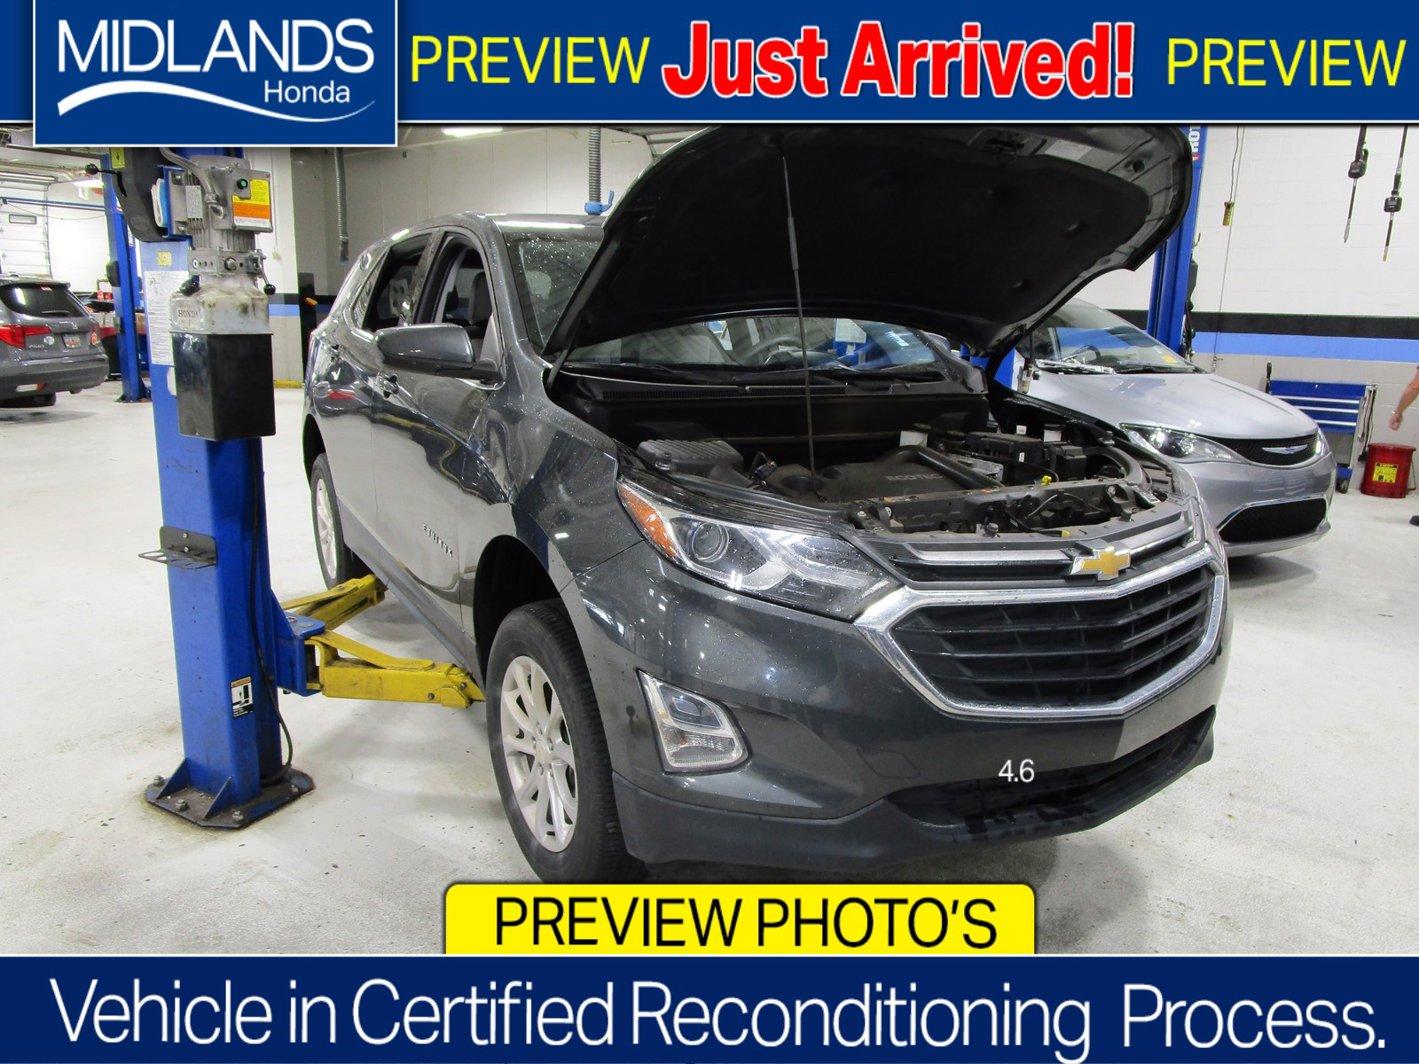 2020 Chevrolet Equinox LT FWD 4dr LT w/1LT Turbocharged Gas I4 1.5L/92 [3]